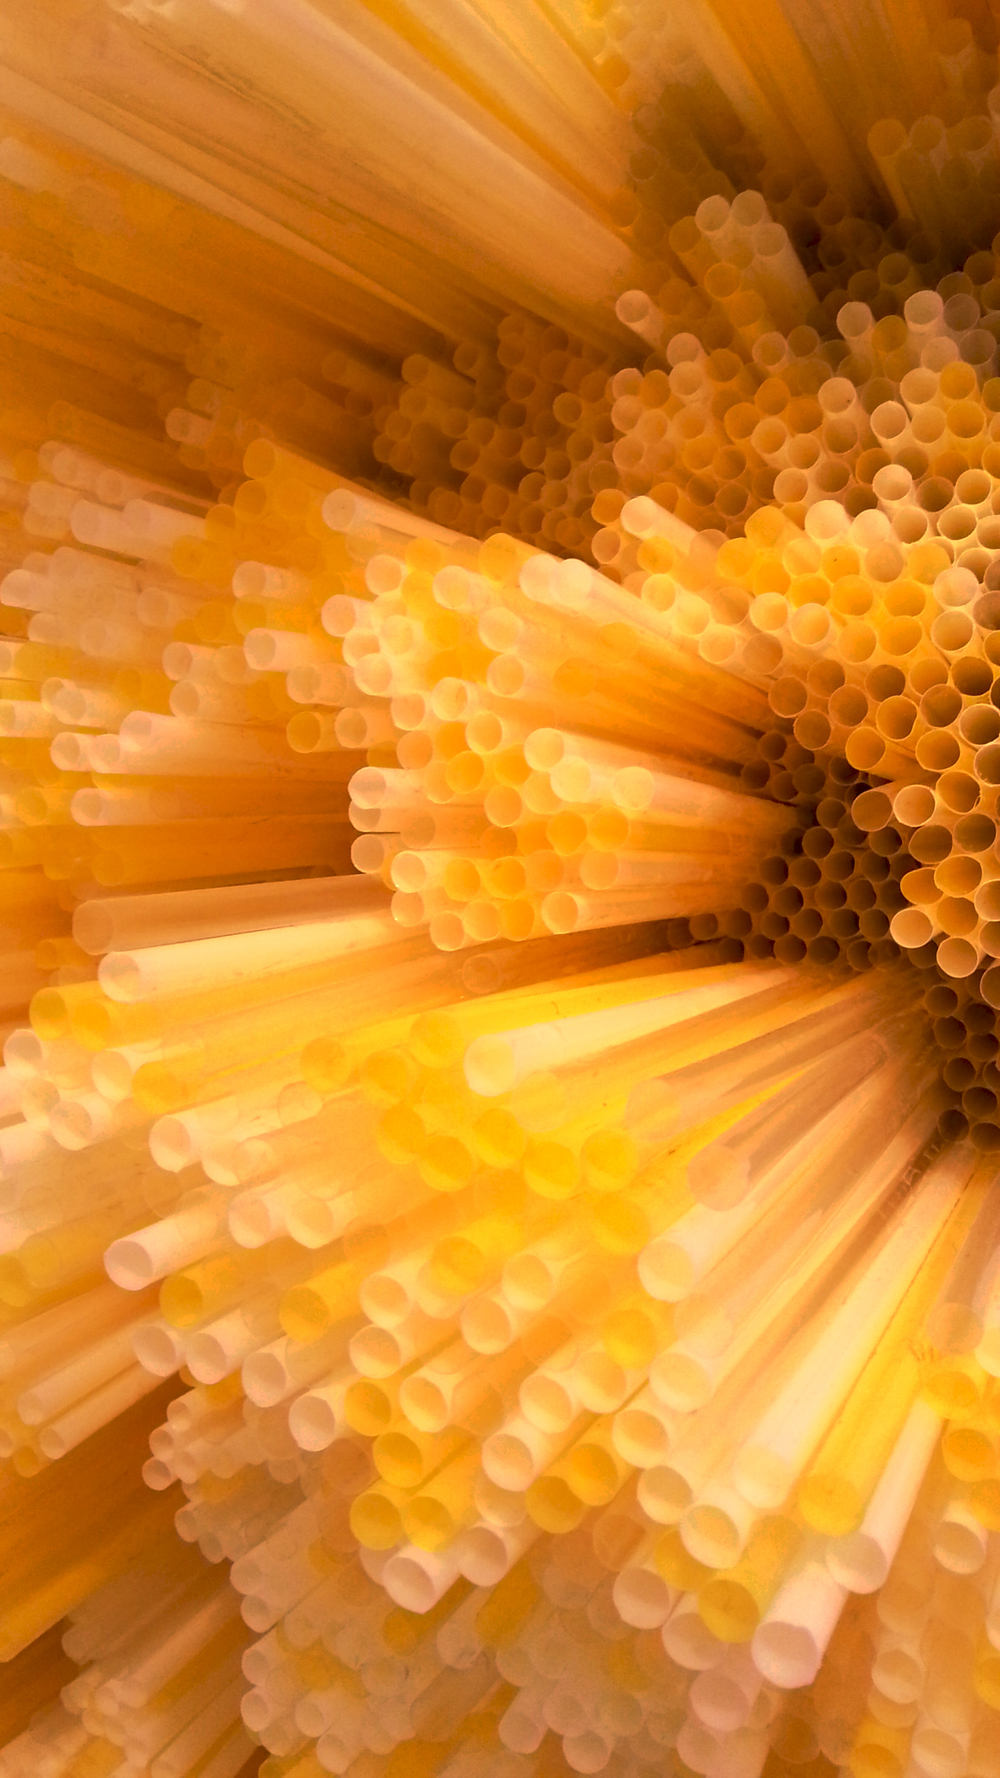 Straws by Francesca Pasquali the-tree-mag 40.jpg